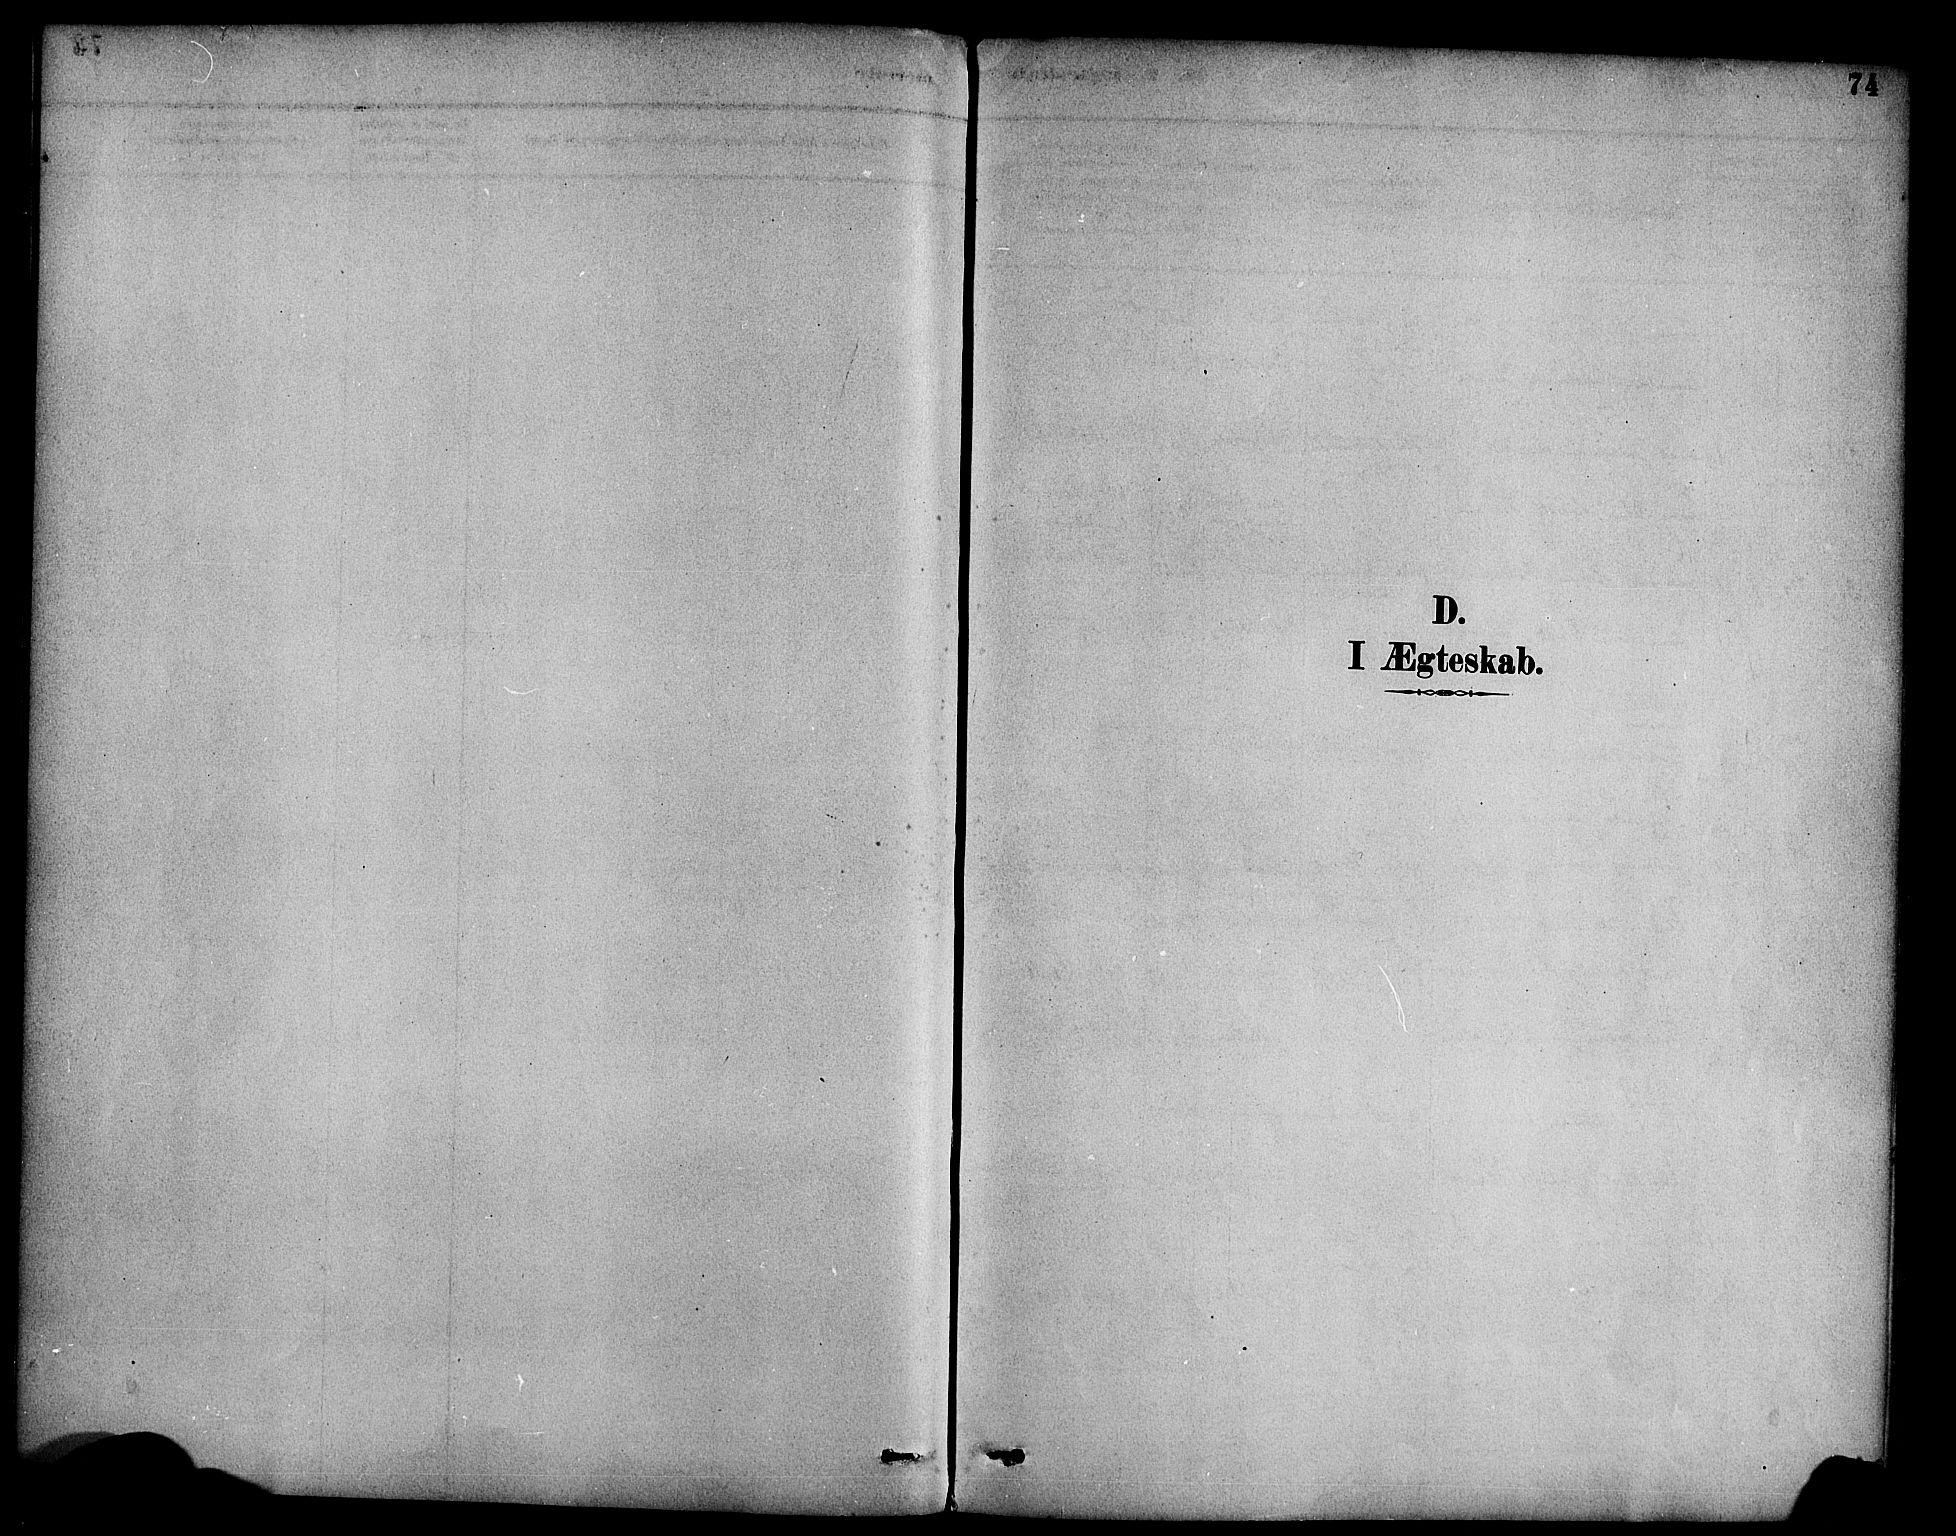 SAB, Hyllestad sokneprestembete, Ministerialbok nr. B 1, 1886-1904, s. 74